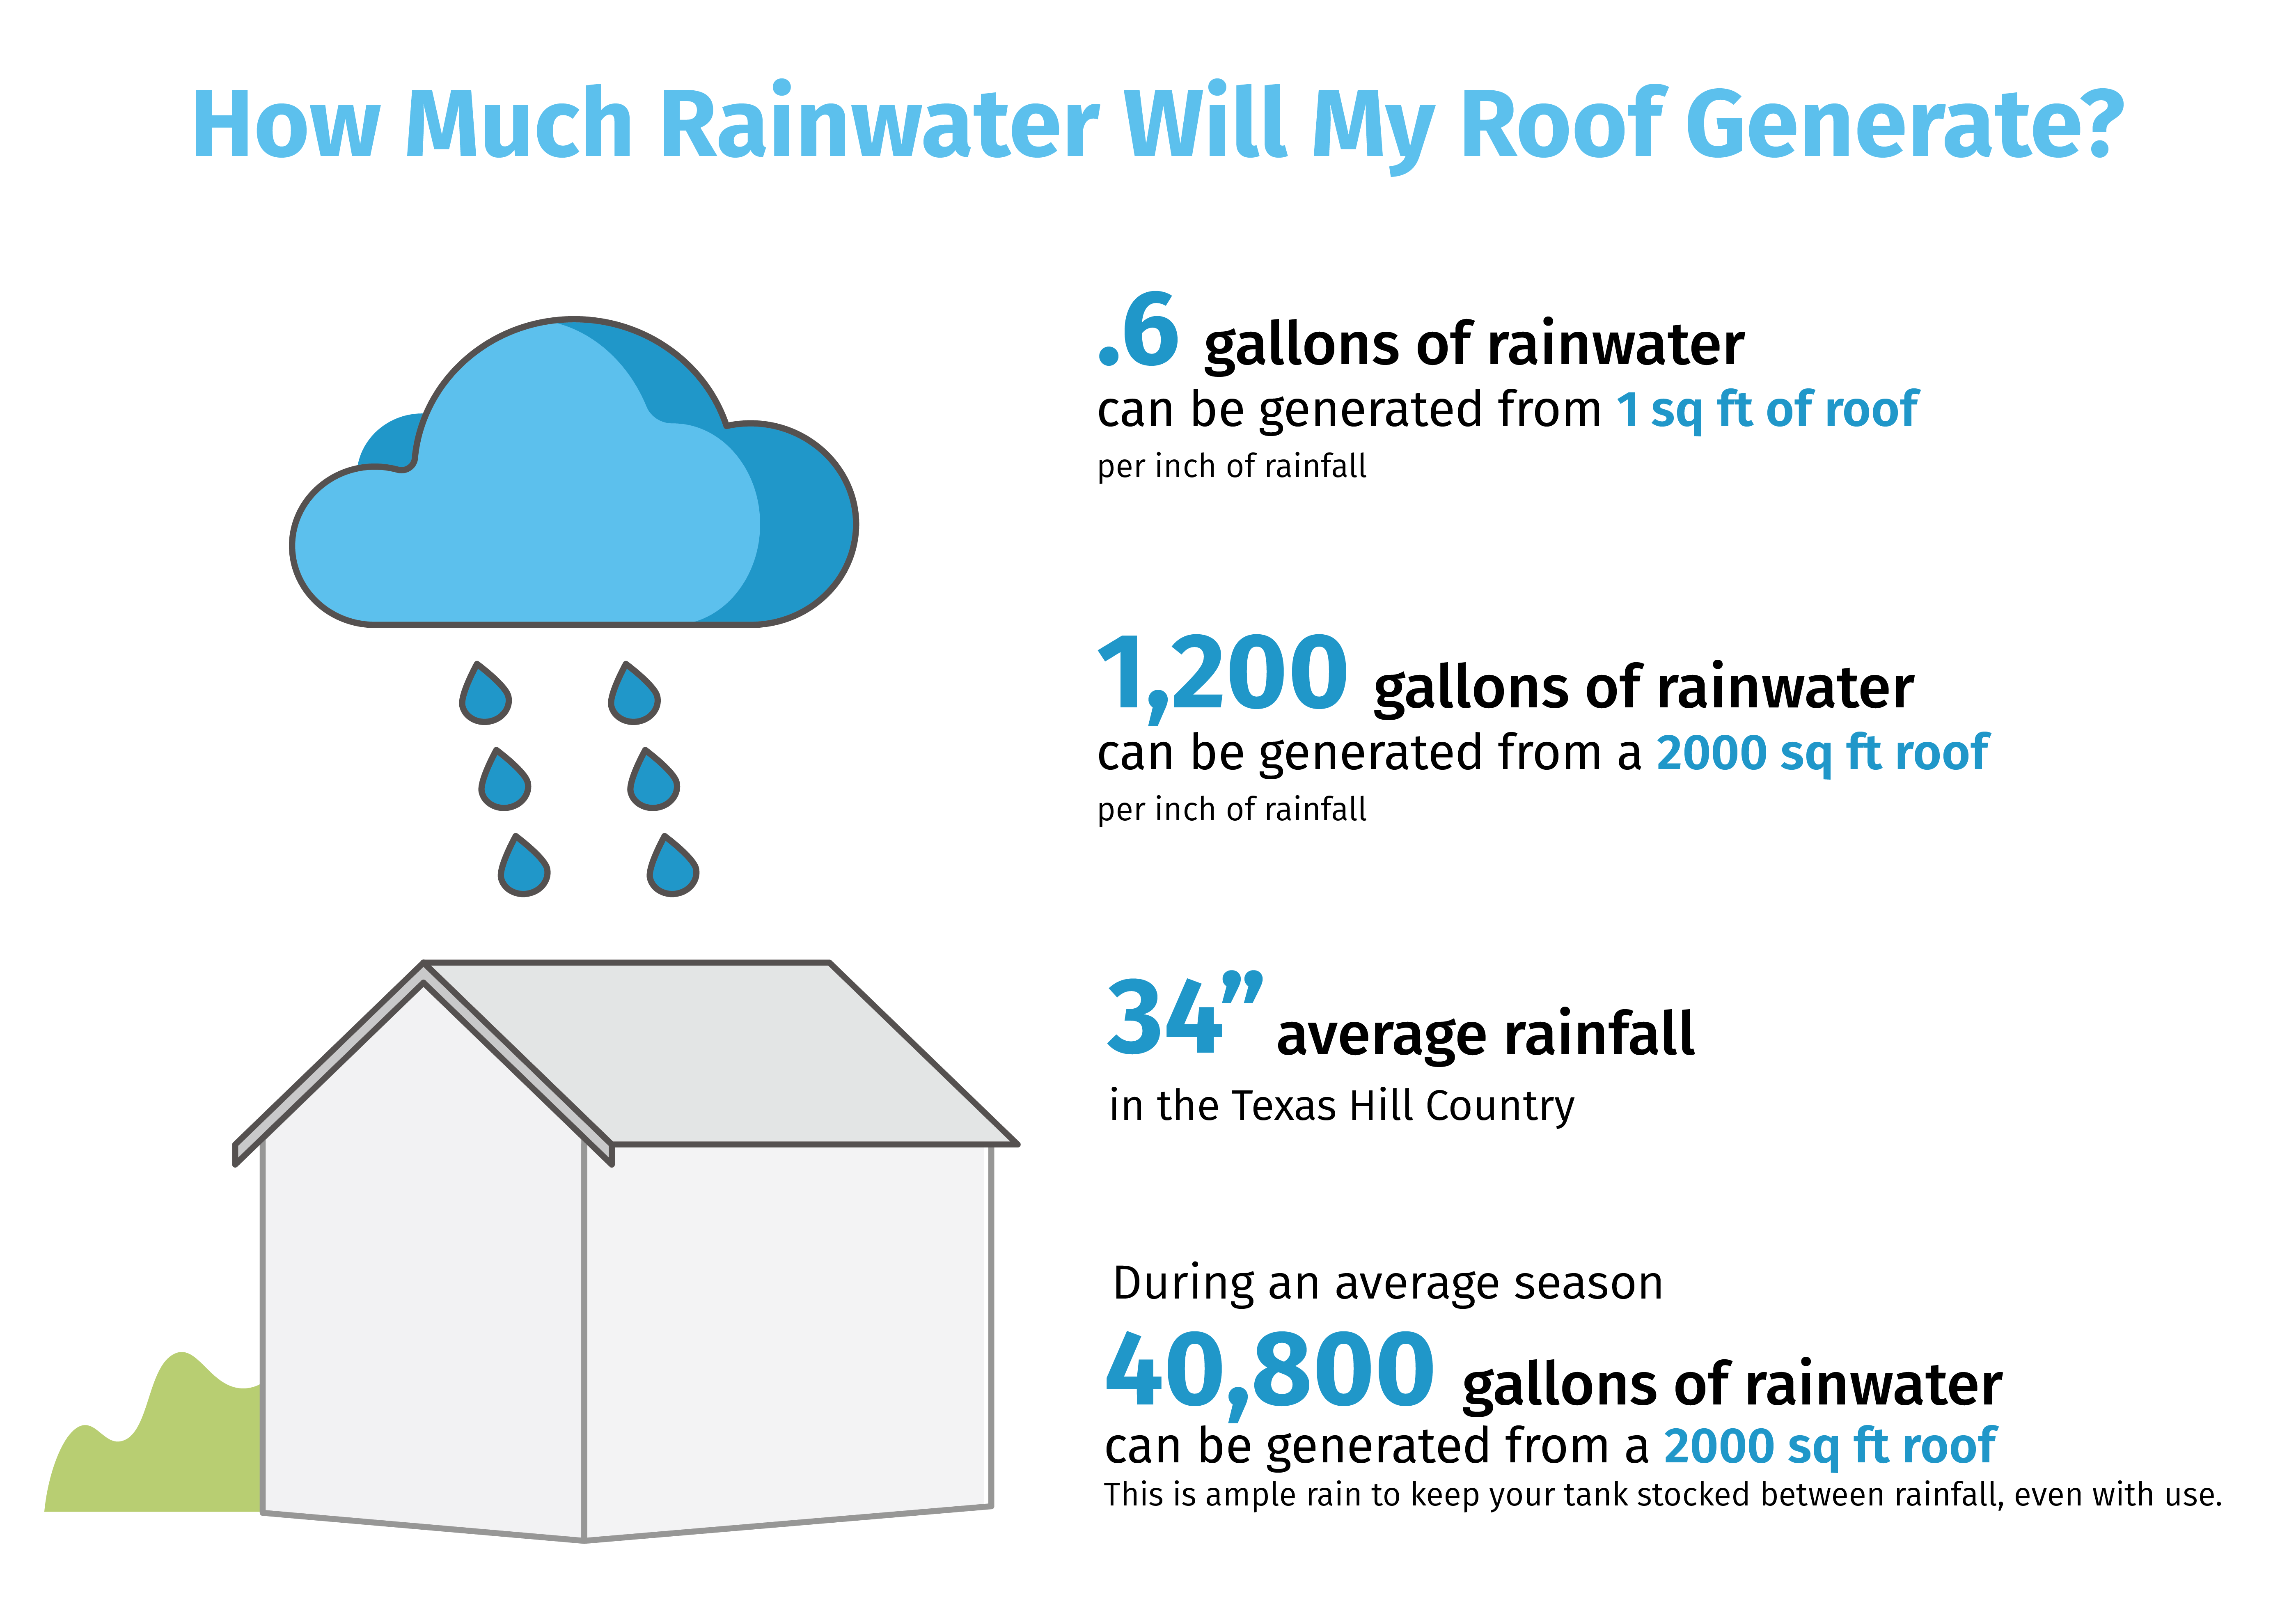 How much rainwater will my roof generate?